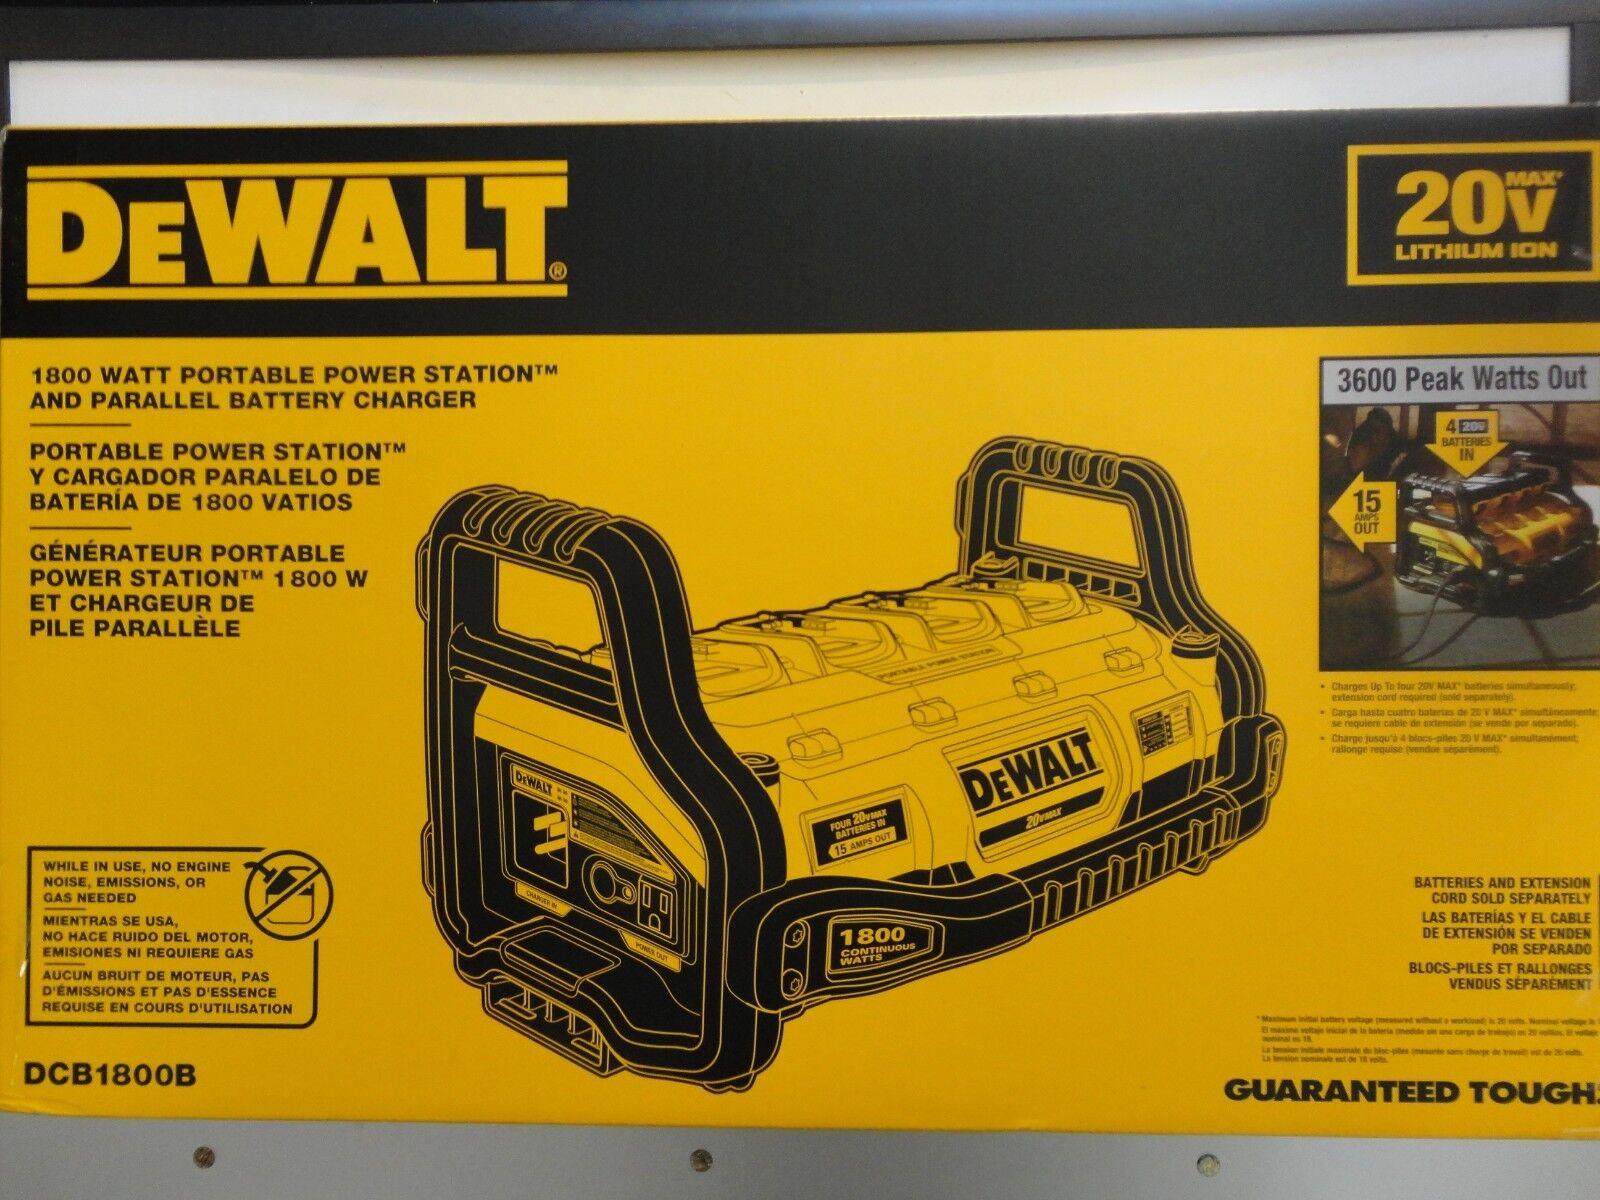 dewalt 20v portable power station and charger dcb1800b ebay